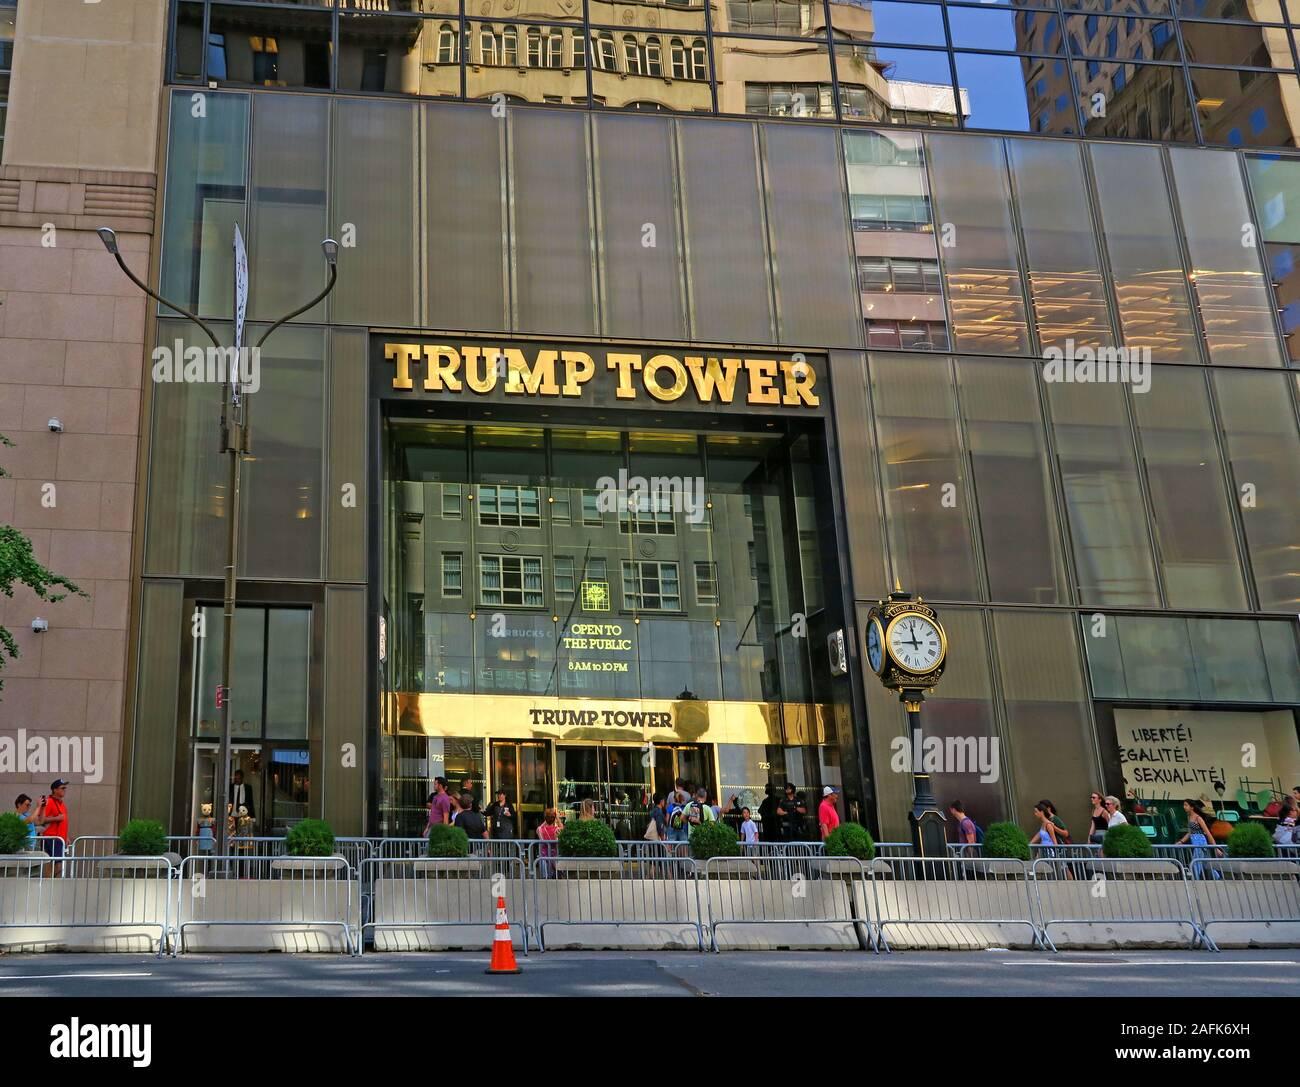 Dieses Stockfoto: Trump Tower Interior, 725 5th Ave, Manhattan, New York, NY 10022, USA, USA - 2AFK6X